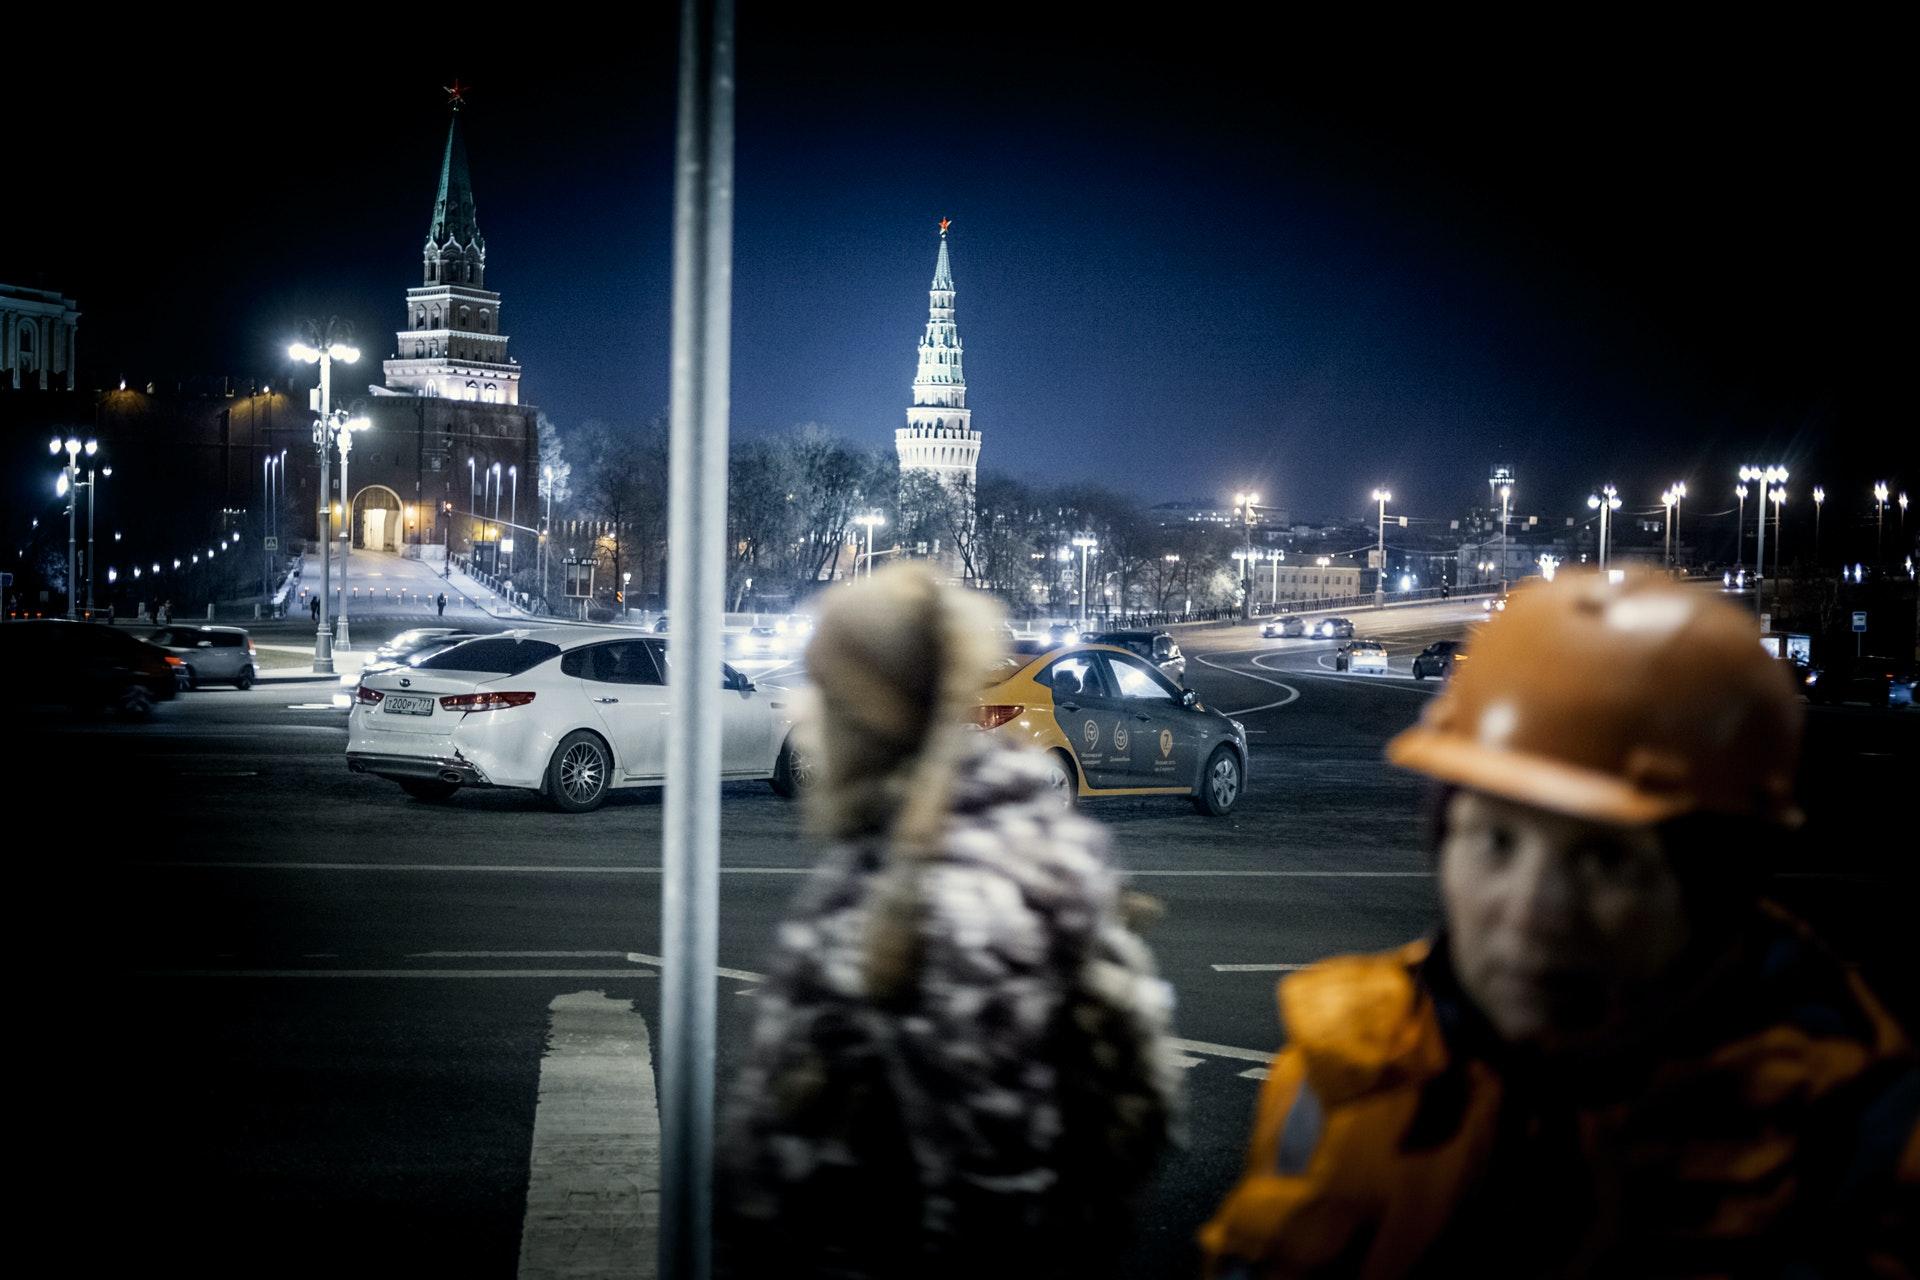 Kanashyuk_Moscow_15